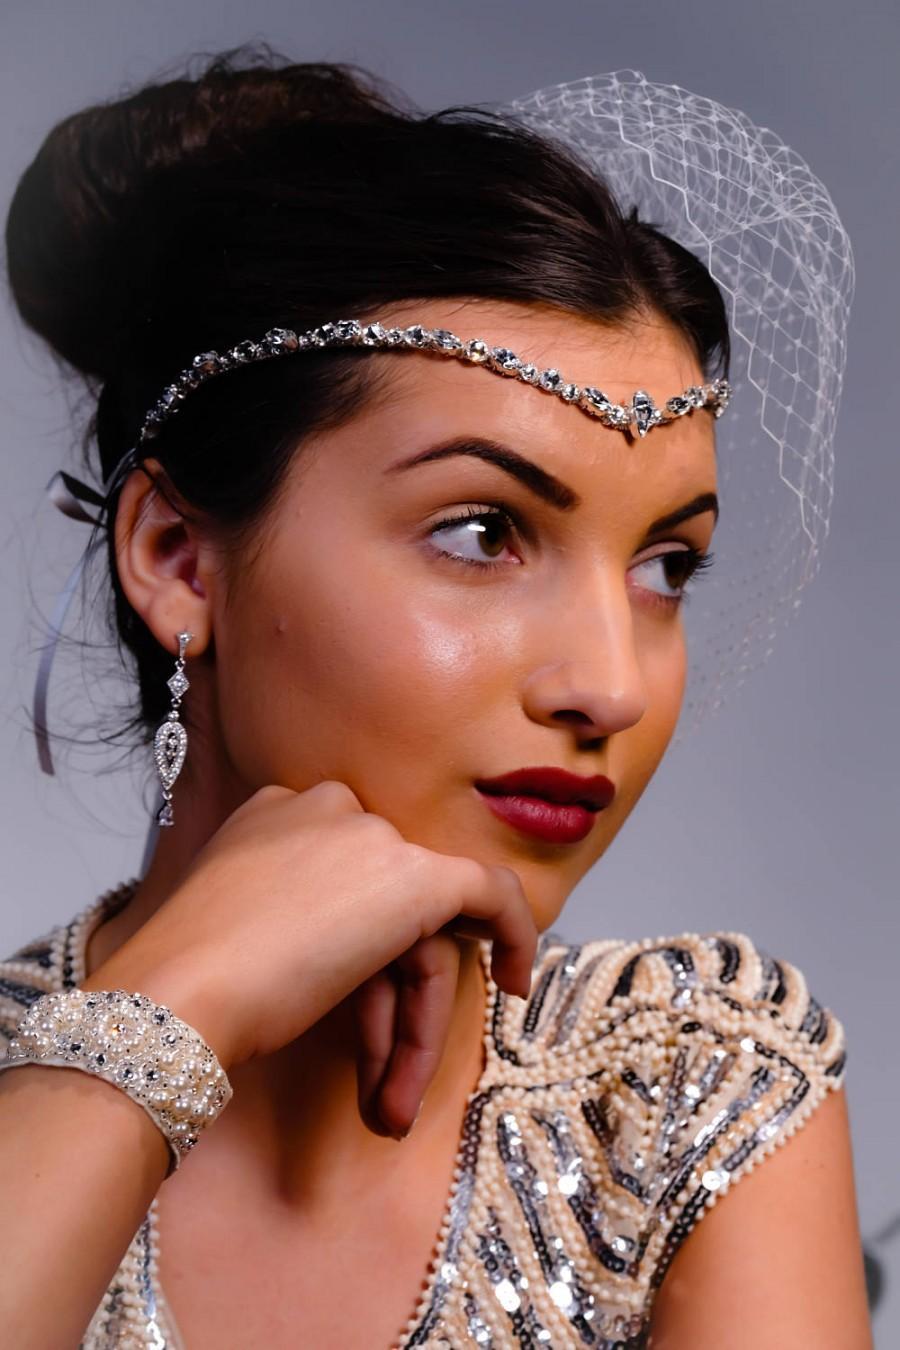 Crystal Head Band Forehead Headdress Bridal Accessories Bride